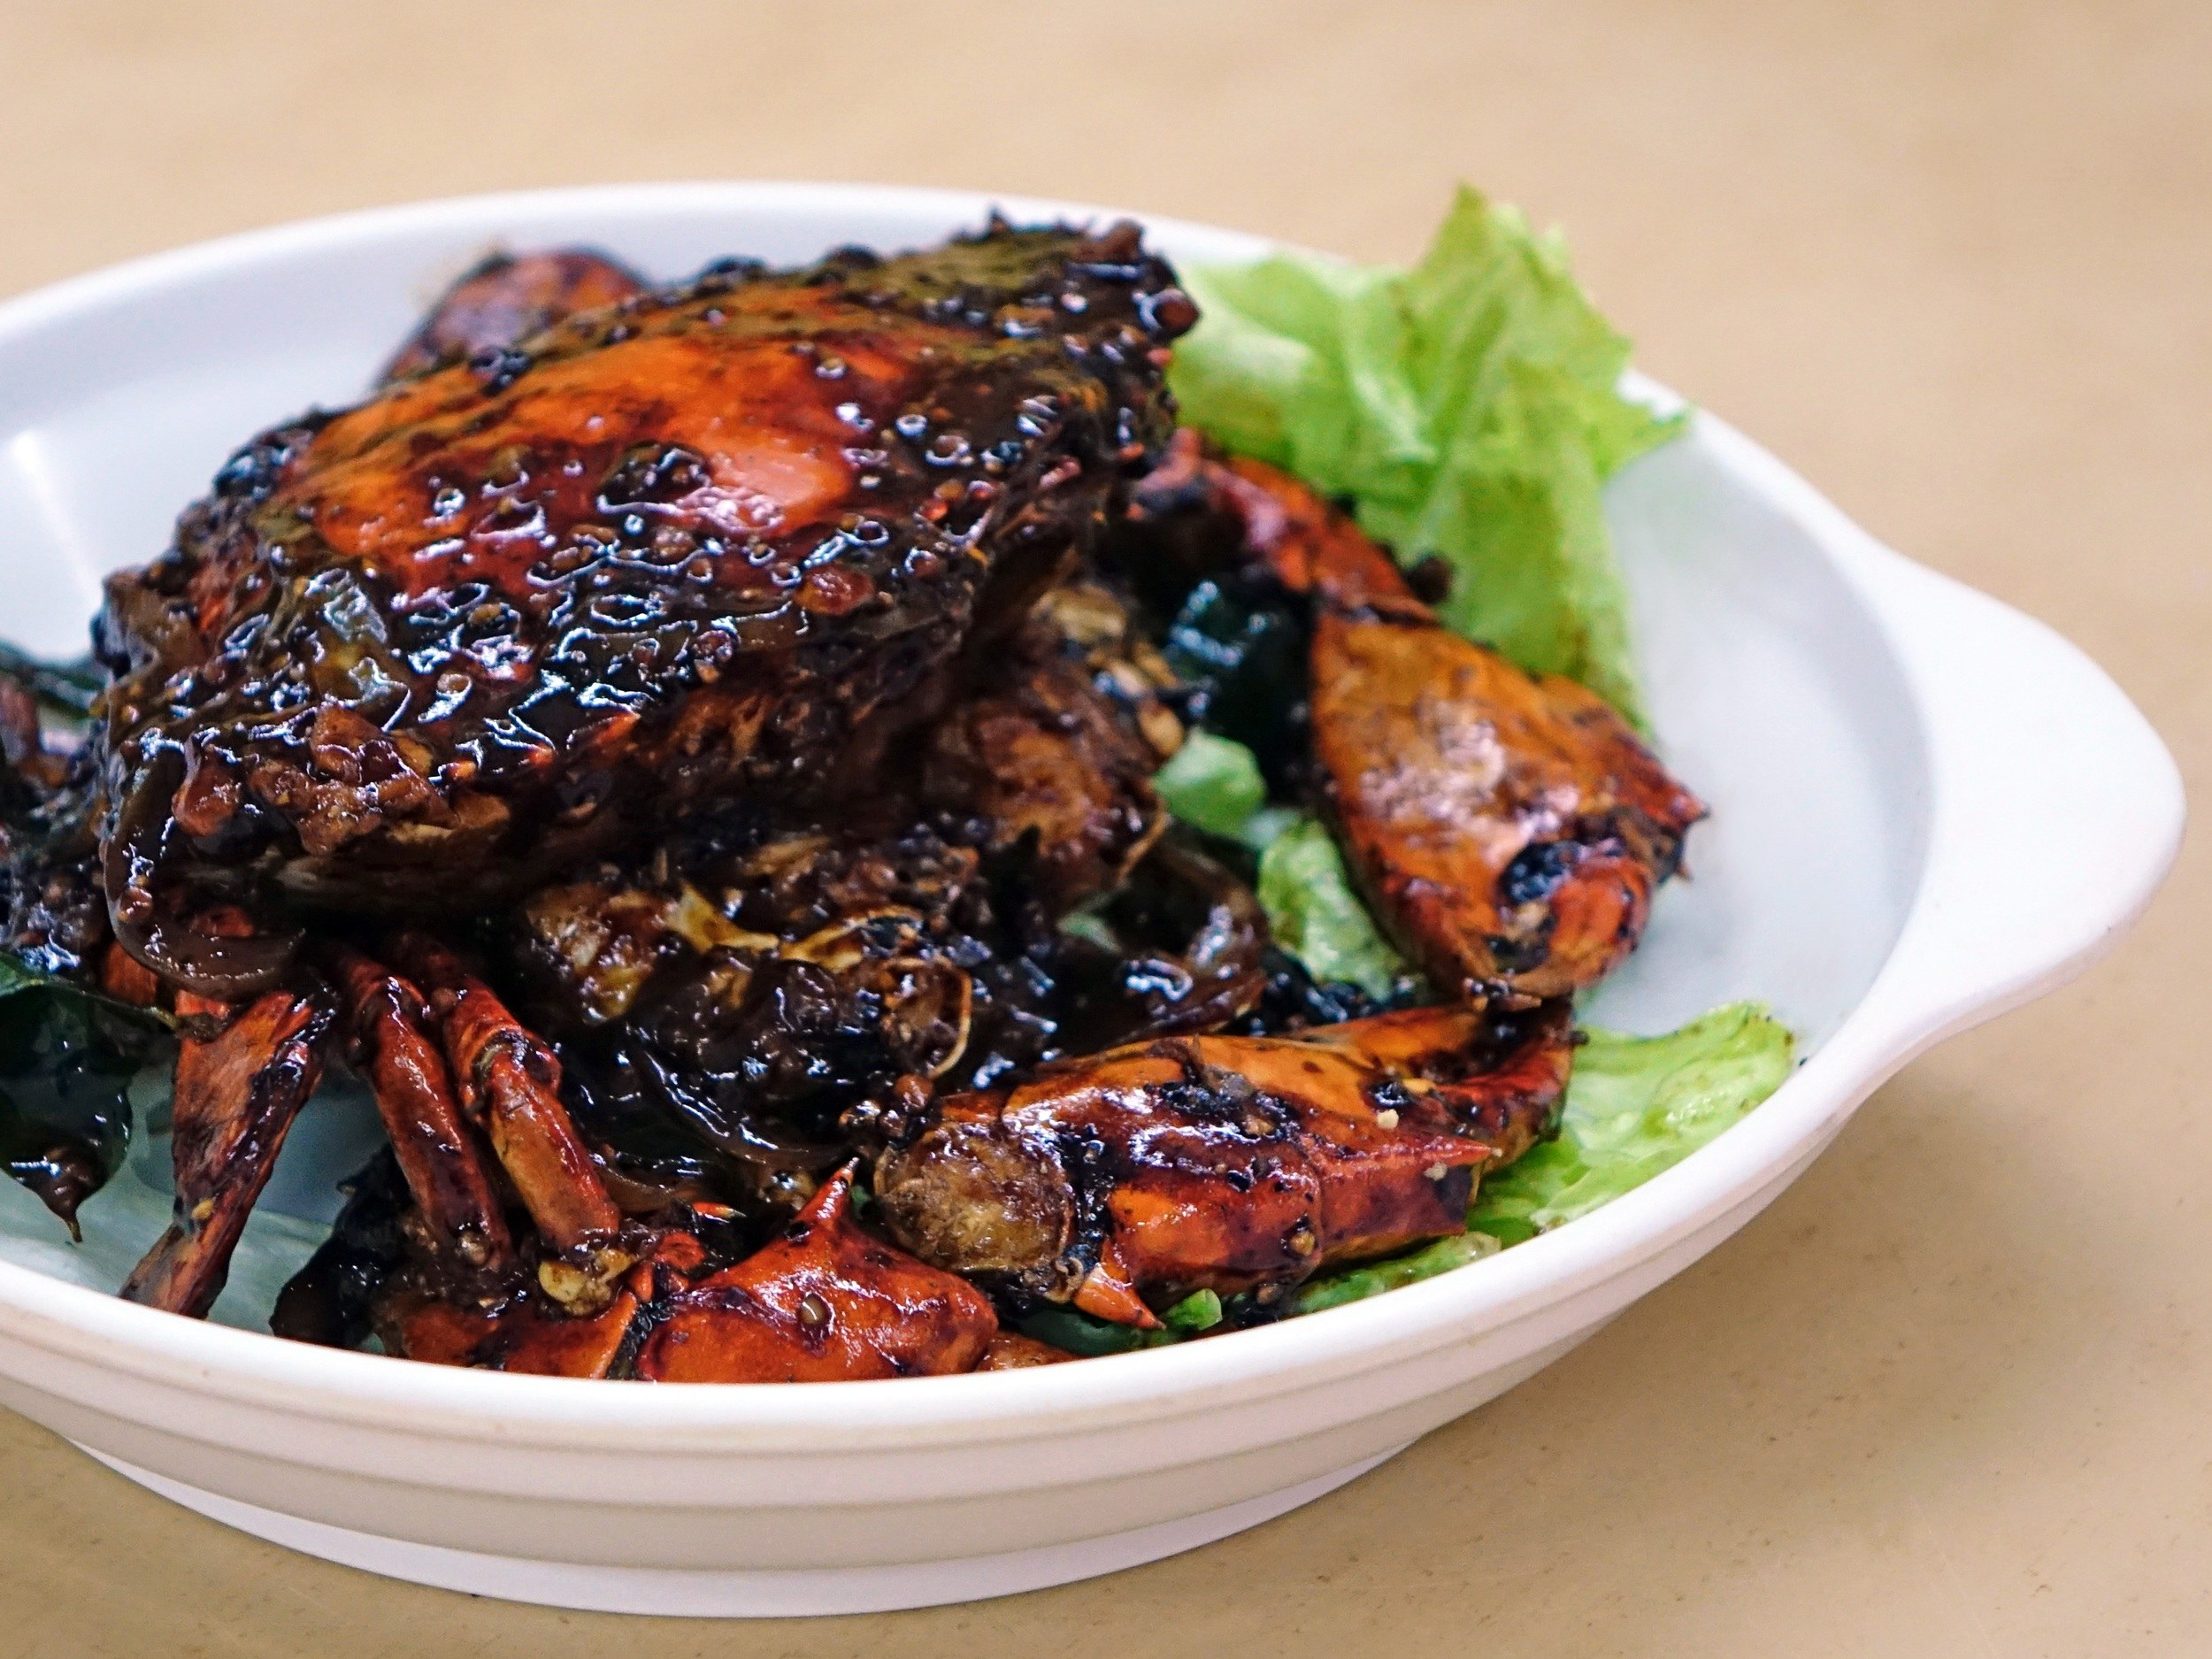 chili-crab-singapore-food